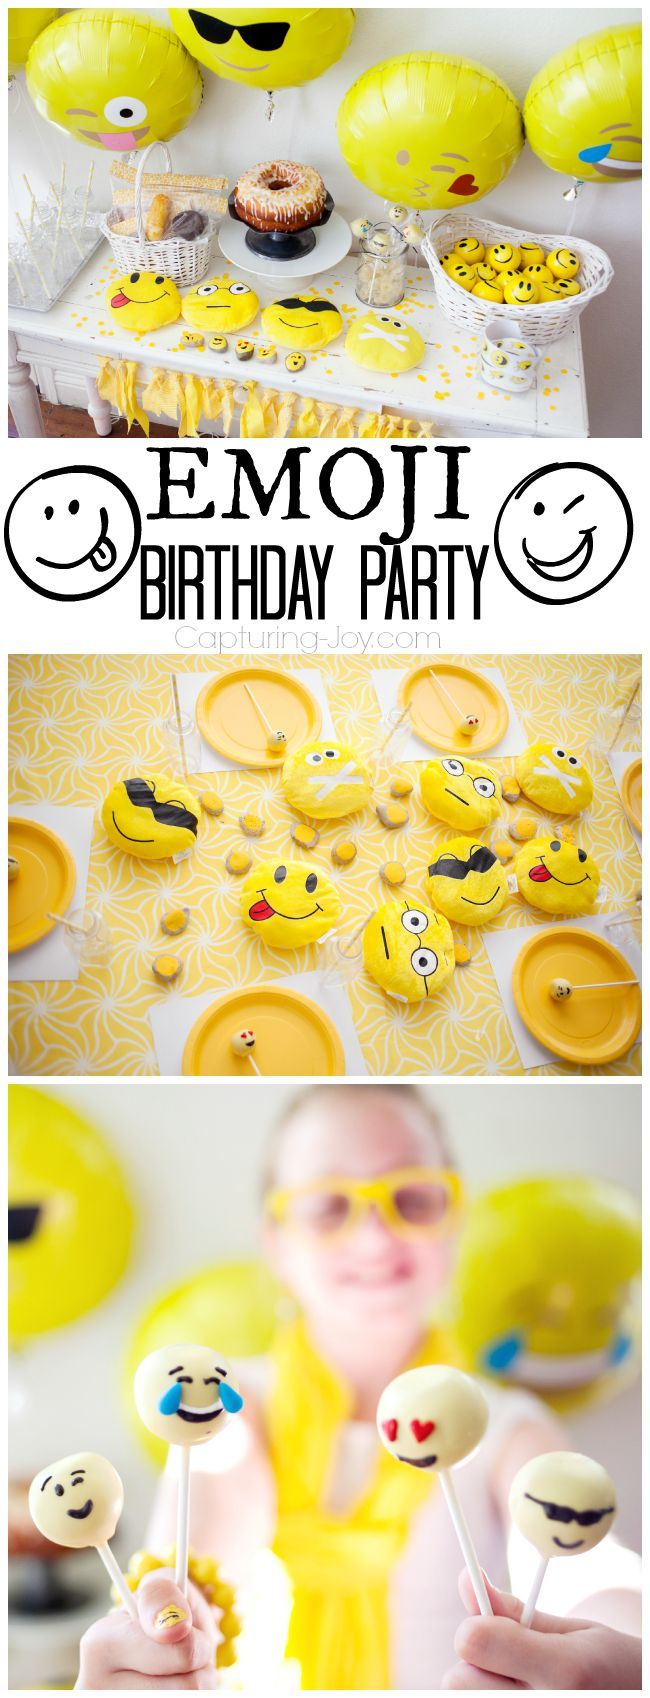 Emoji Birthday Party With Happy Face Emoticons